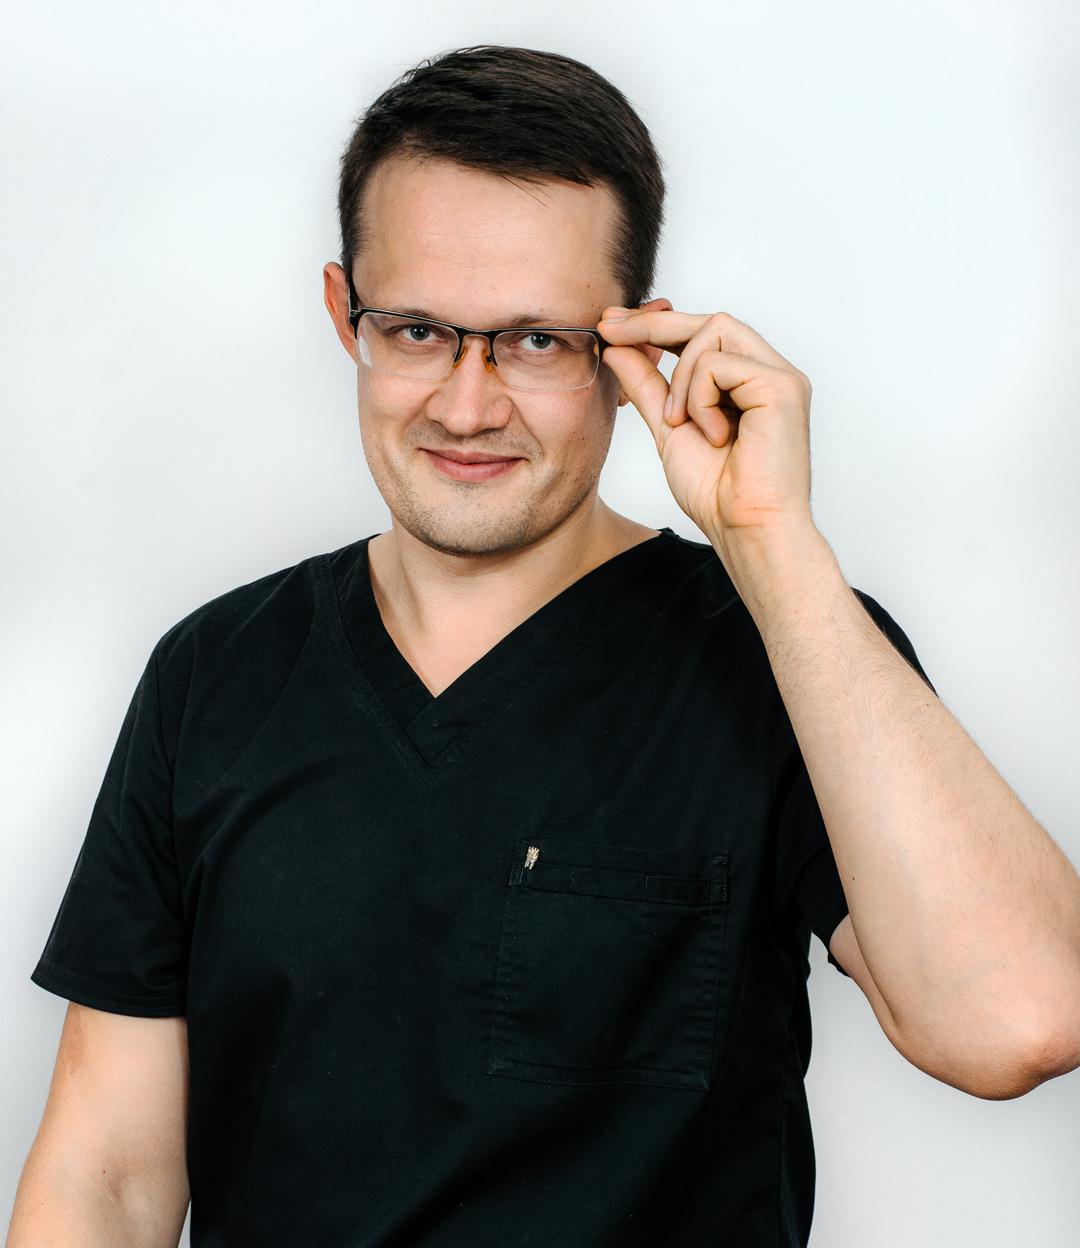 Алексеев Алексей Владимирович